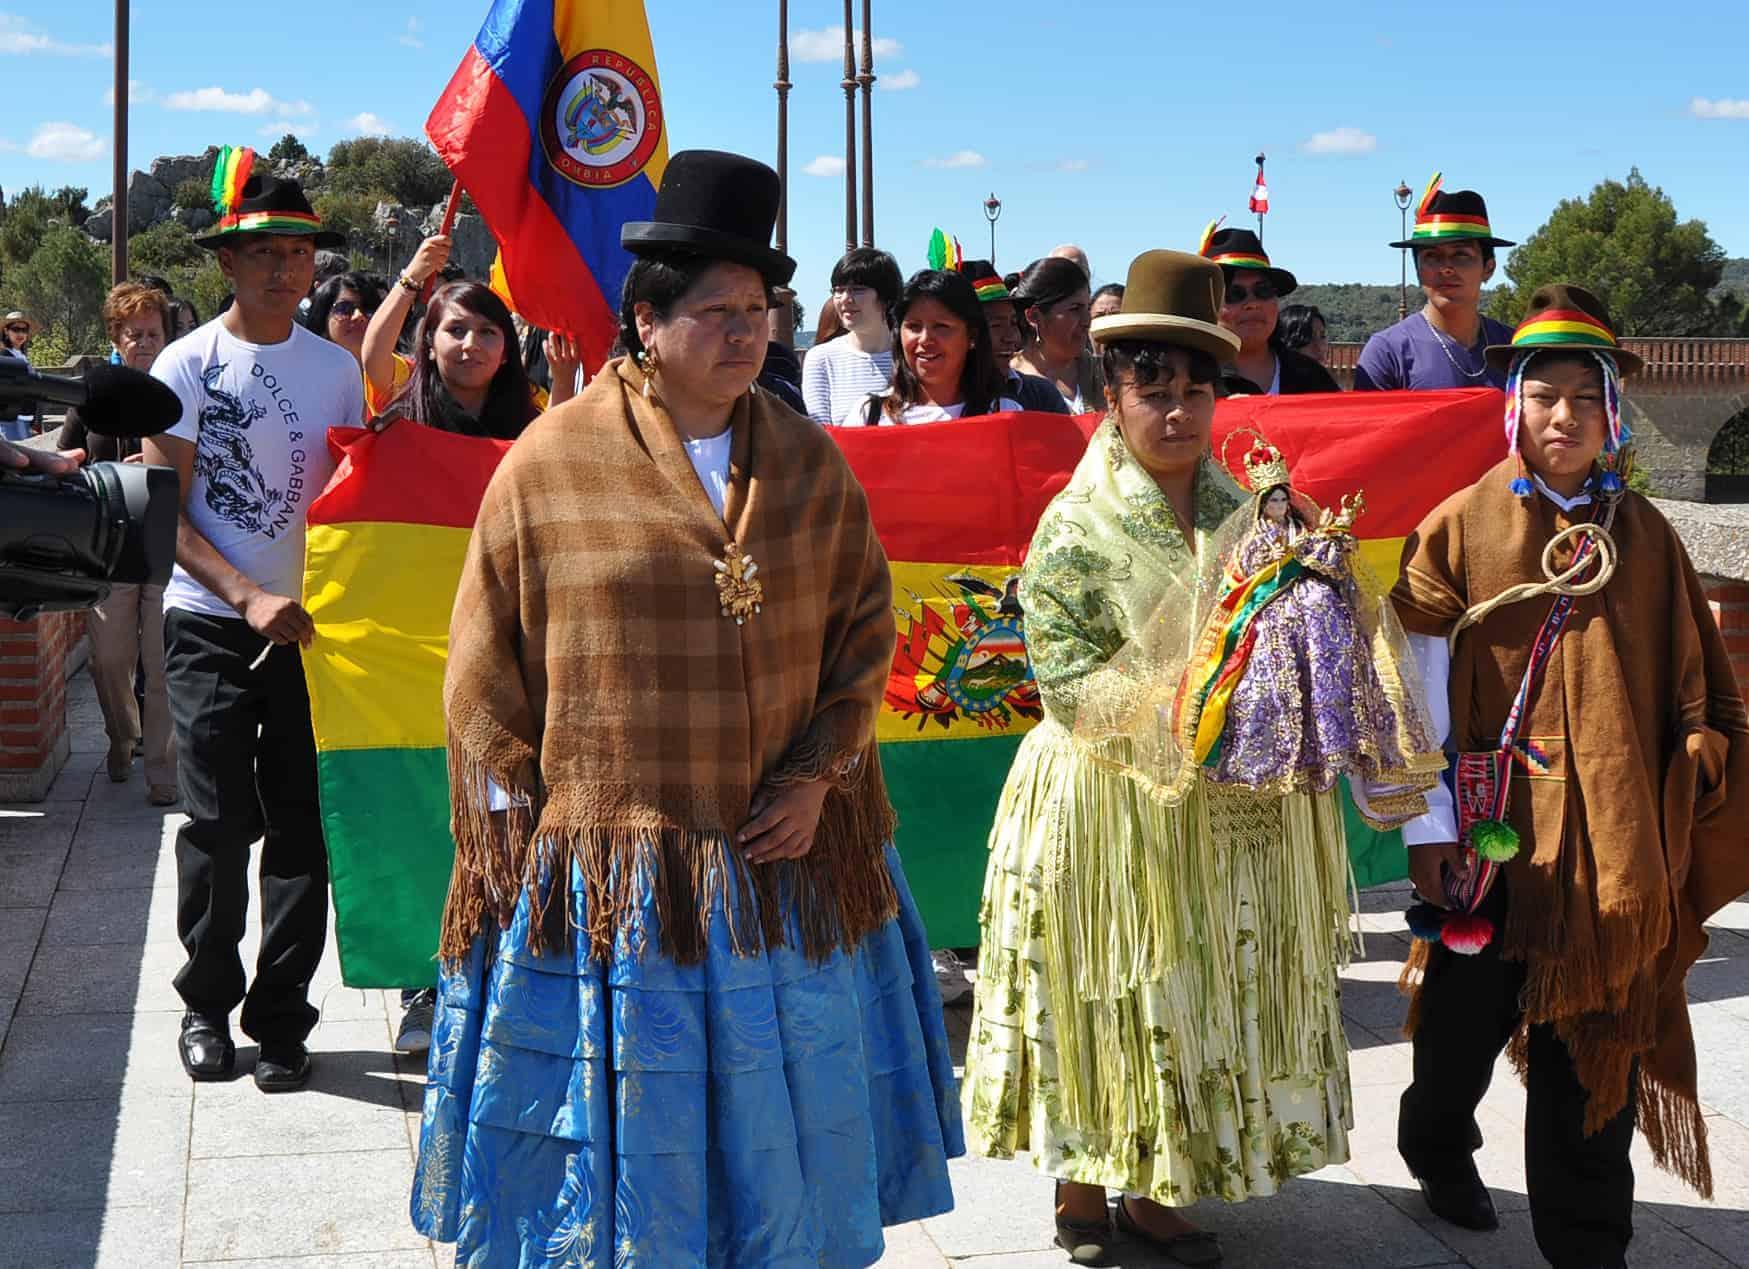 procesion_con_la_virgen_de_urkupina_bolivia.jpg